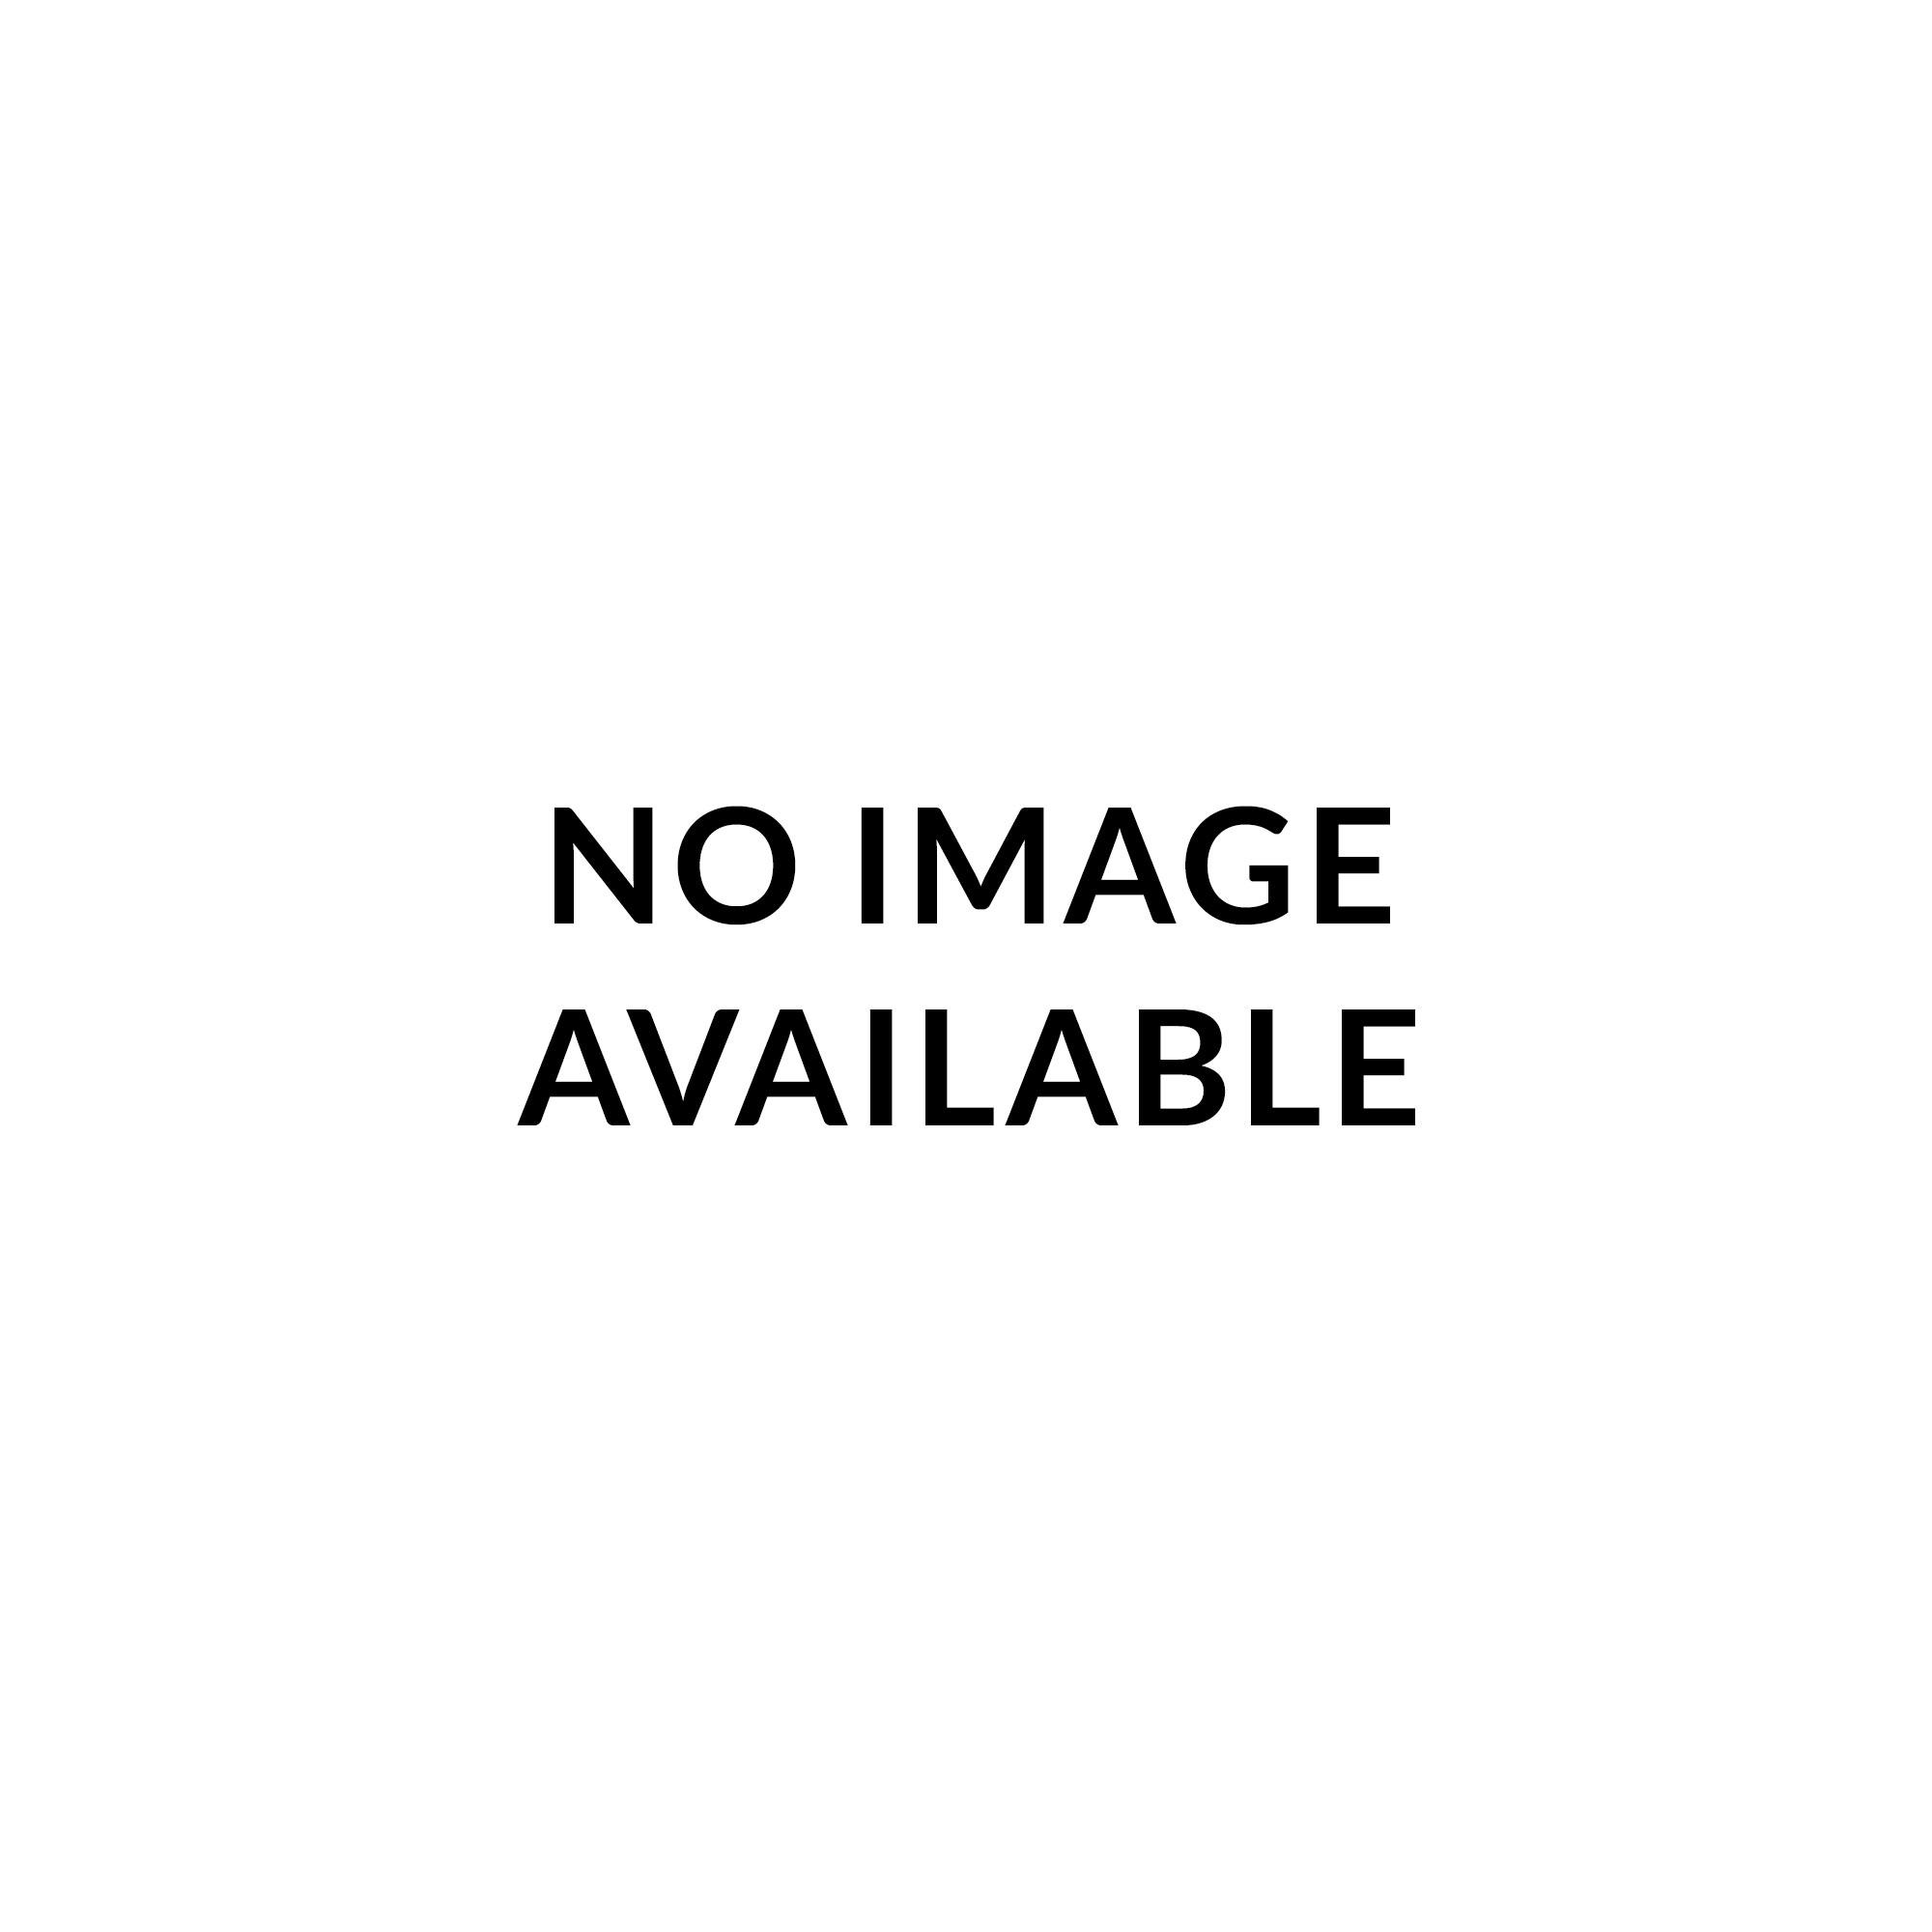 D'Addario PSB120 ProSteels XL Bass Single String .120 Long Scale